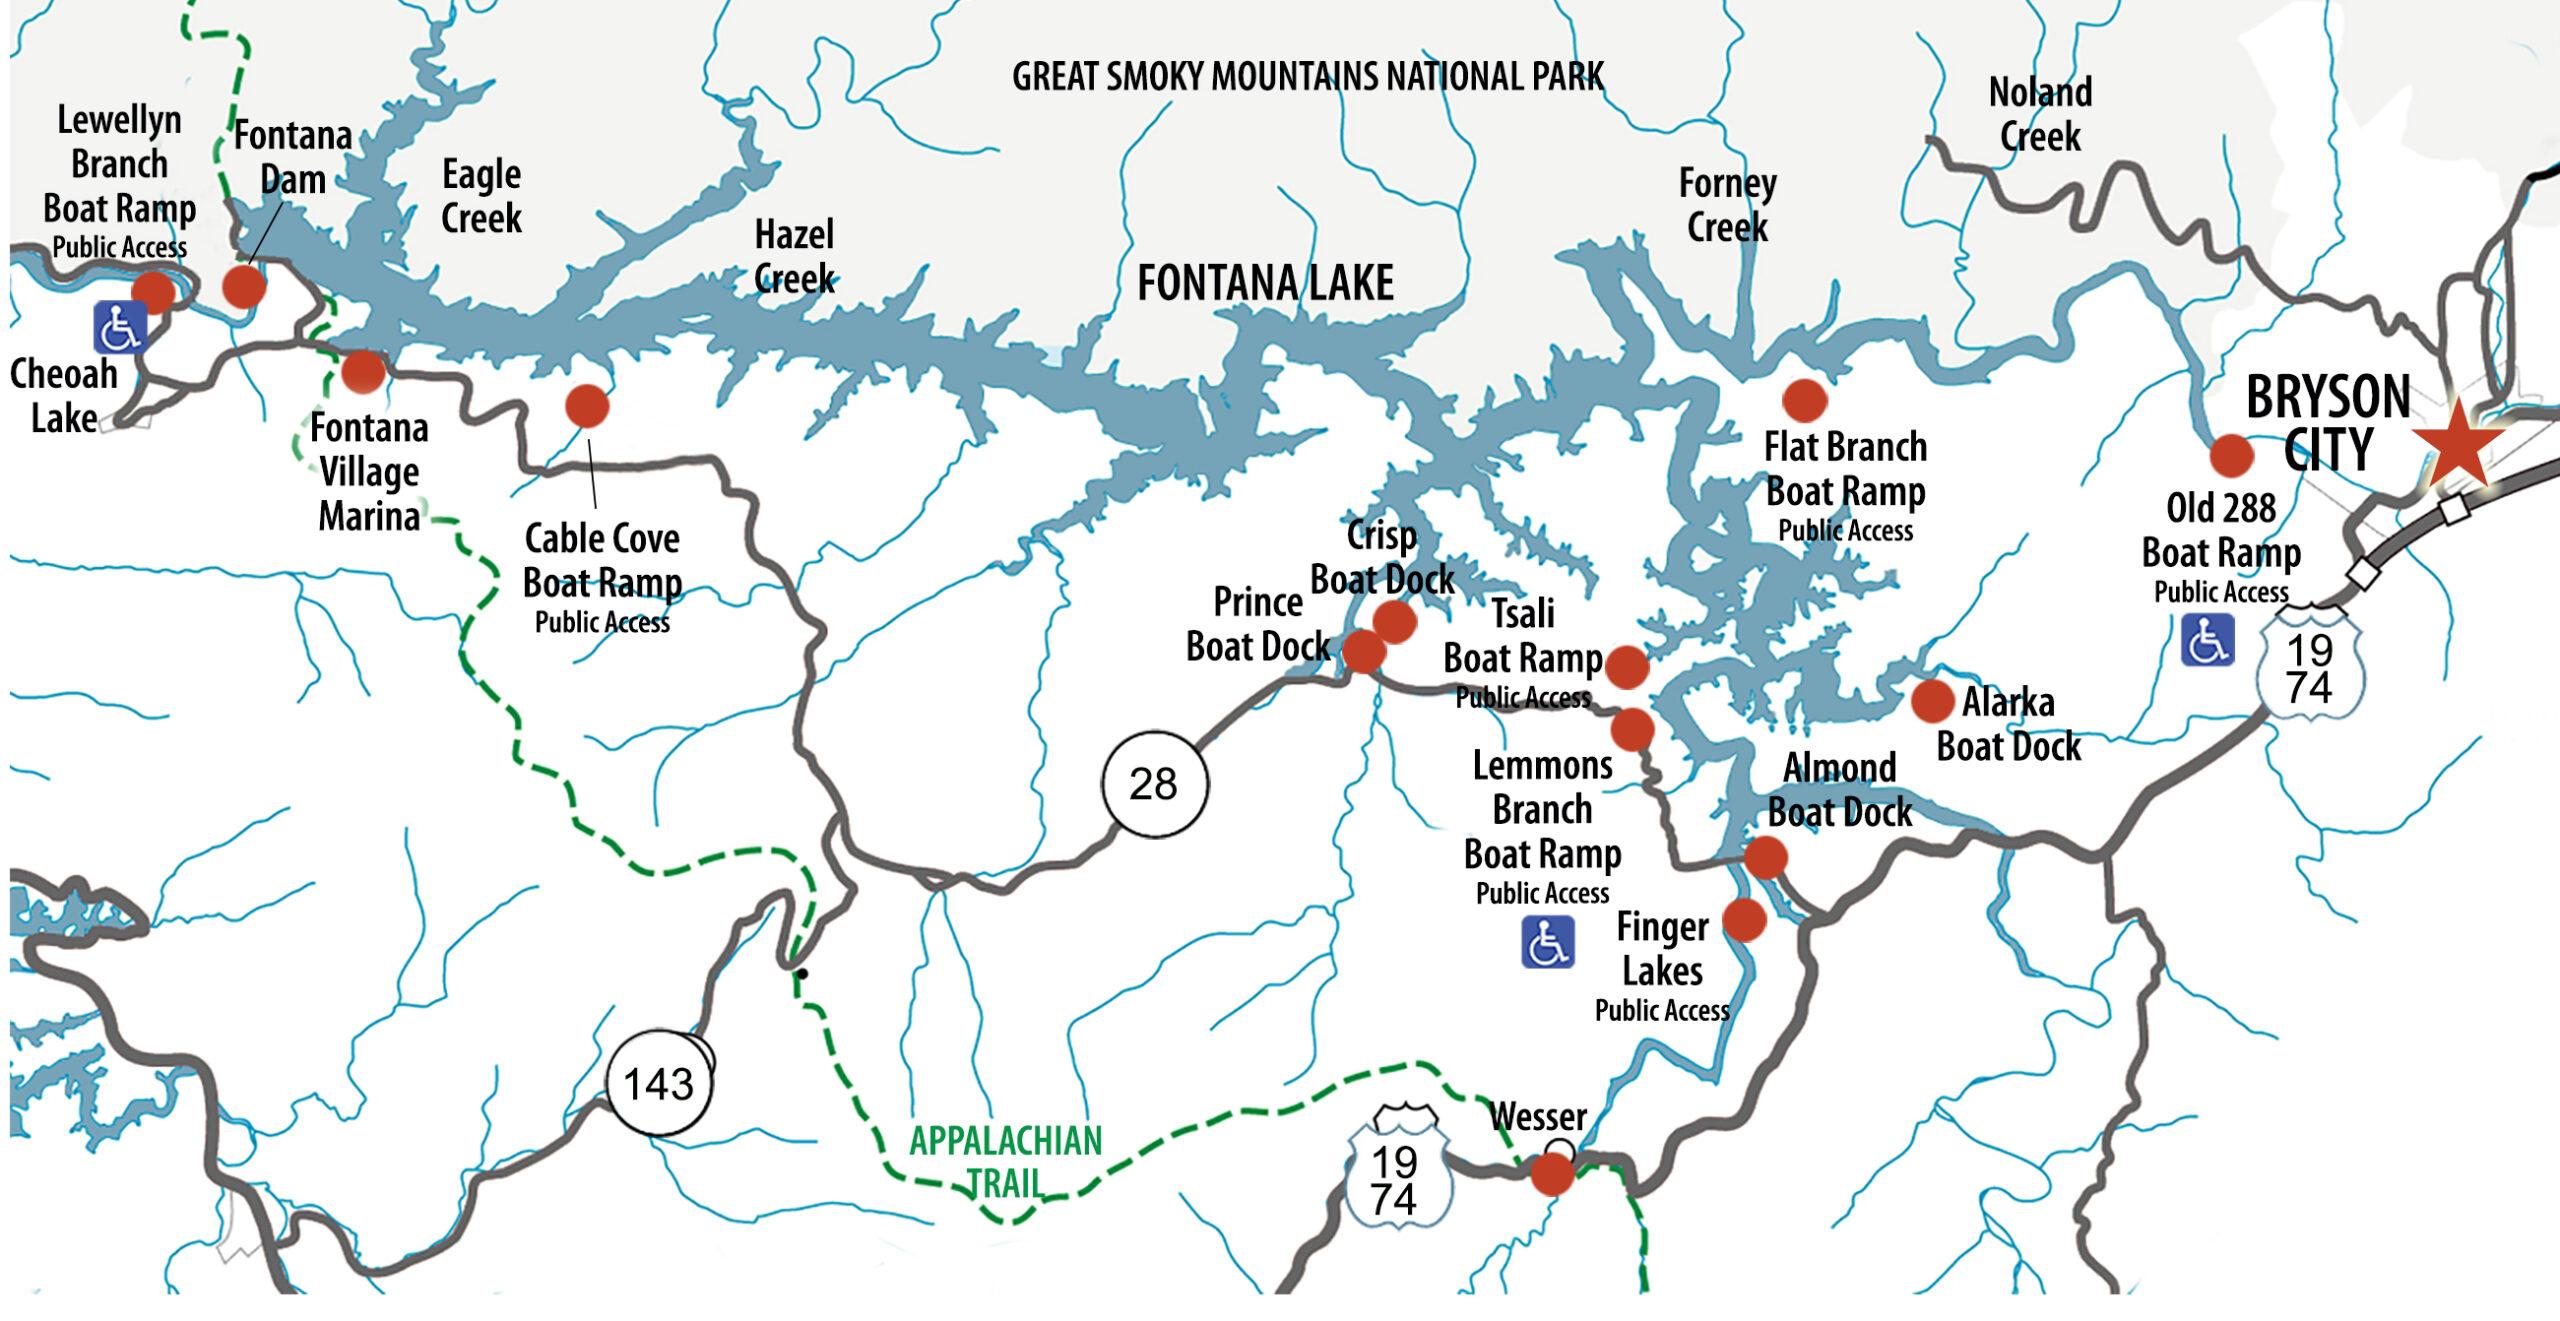 Fontana Lake boat access